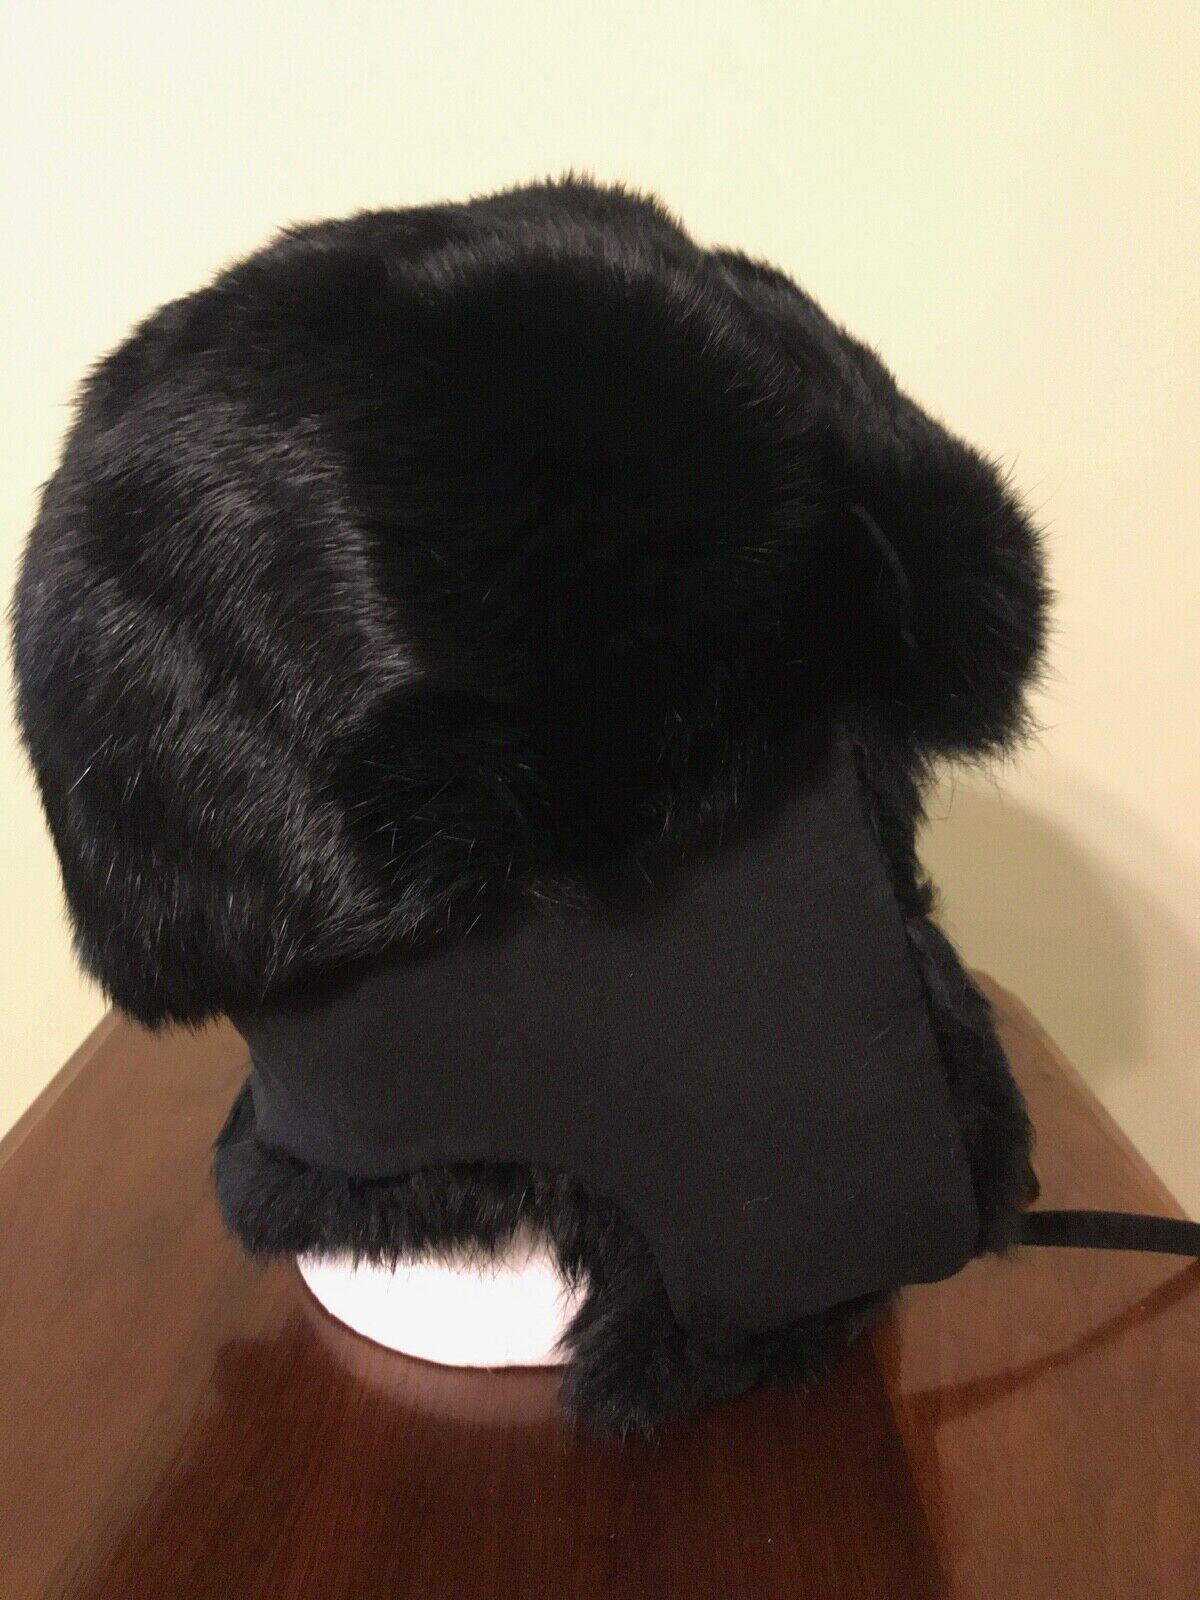 Vintage Black Mink Ladies' Hat with Flap Ear Muffs - image 8